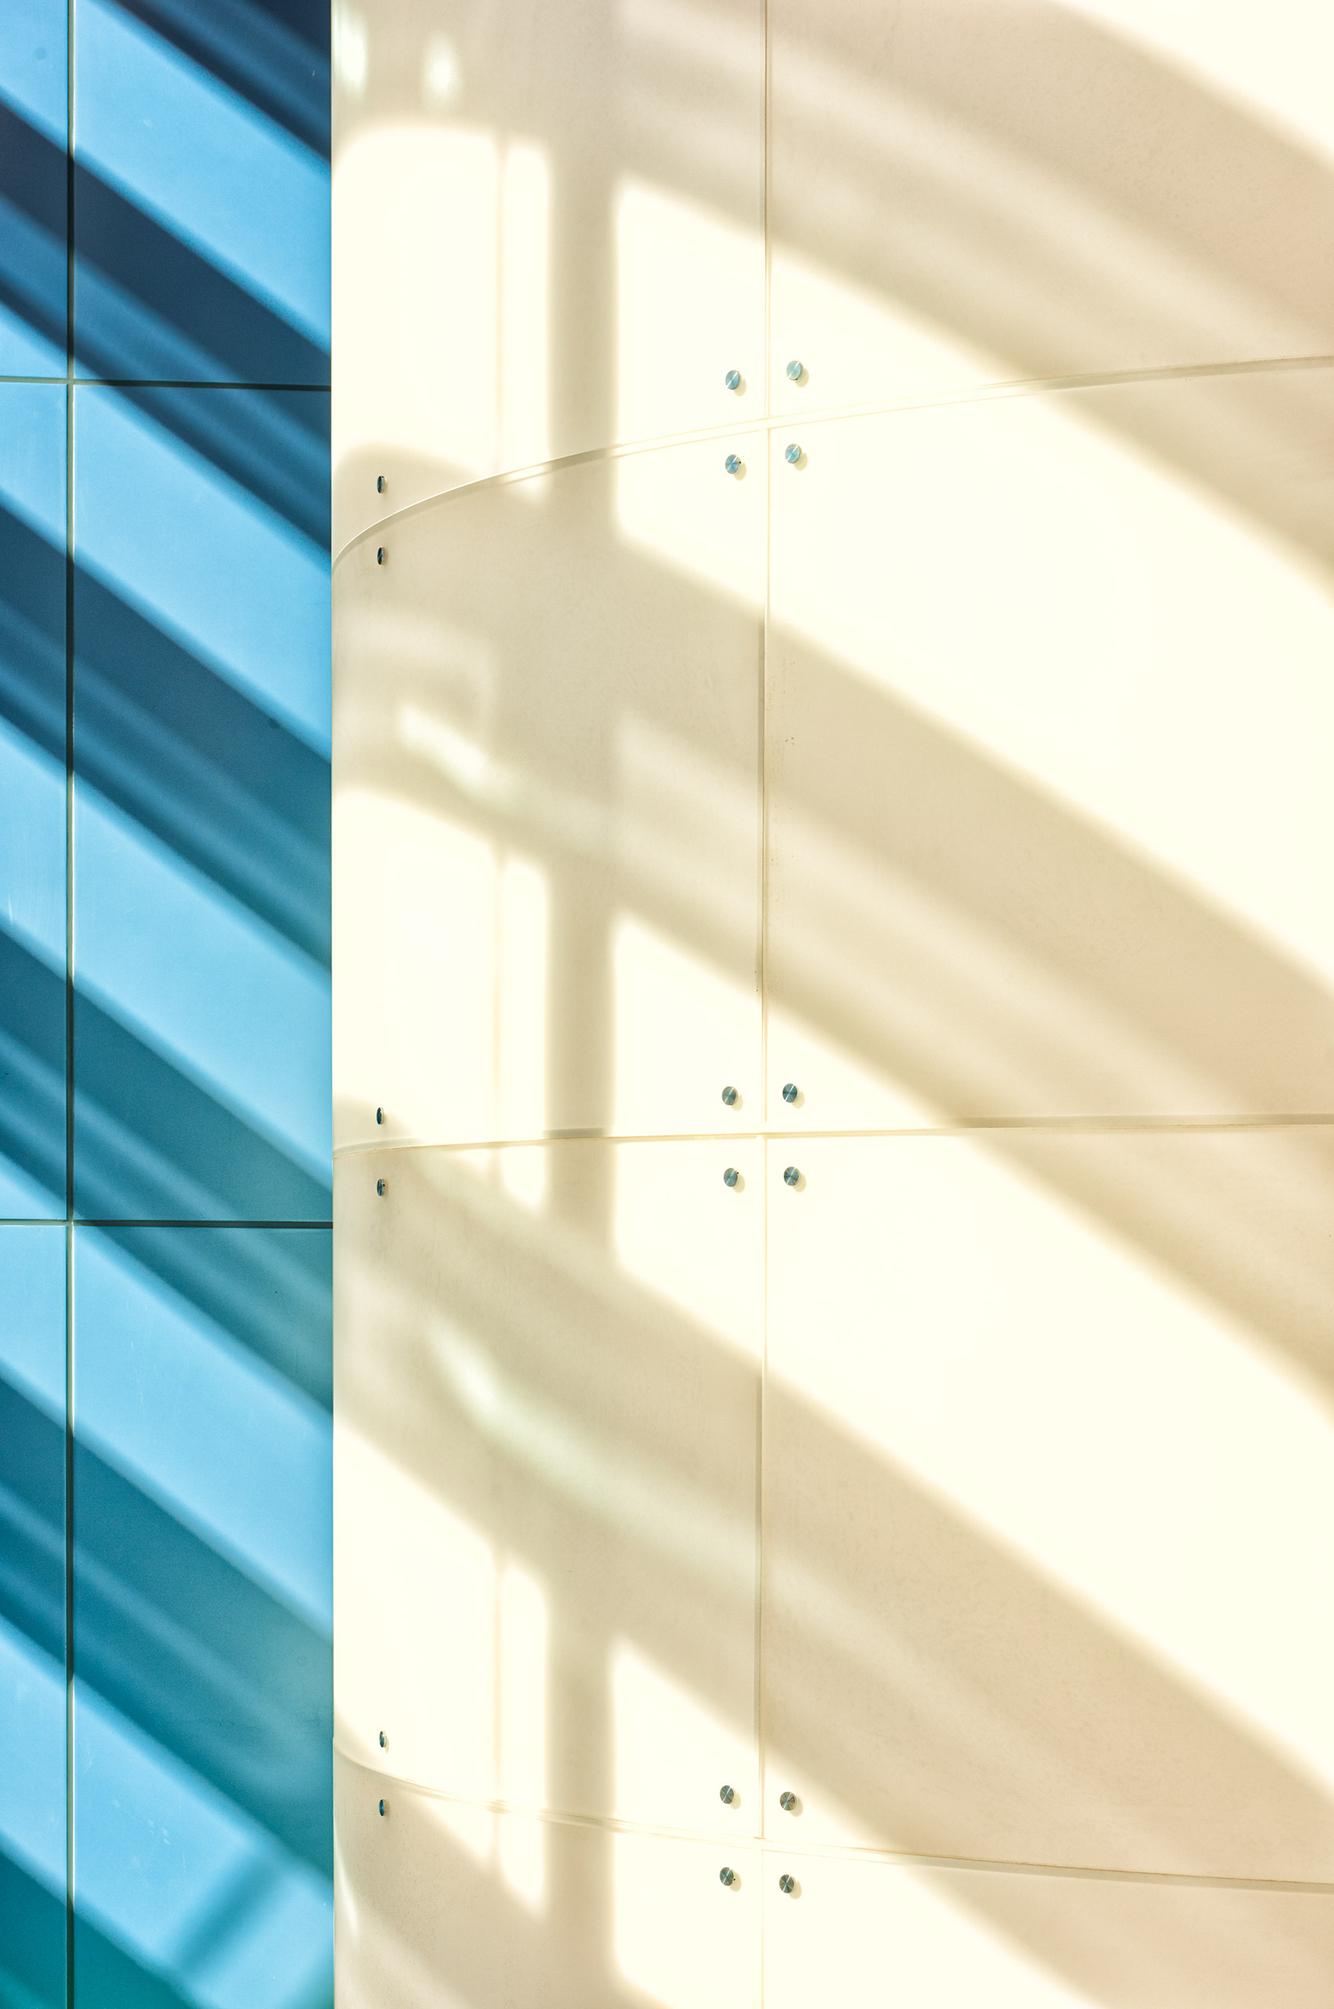 John-Sutton-Photography-InnovationCurve.jpg